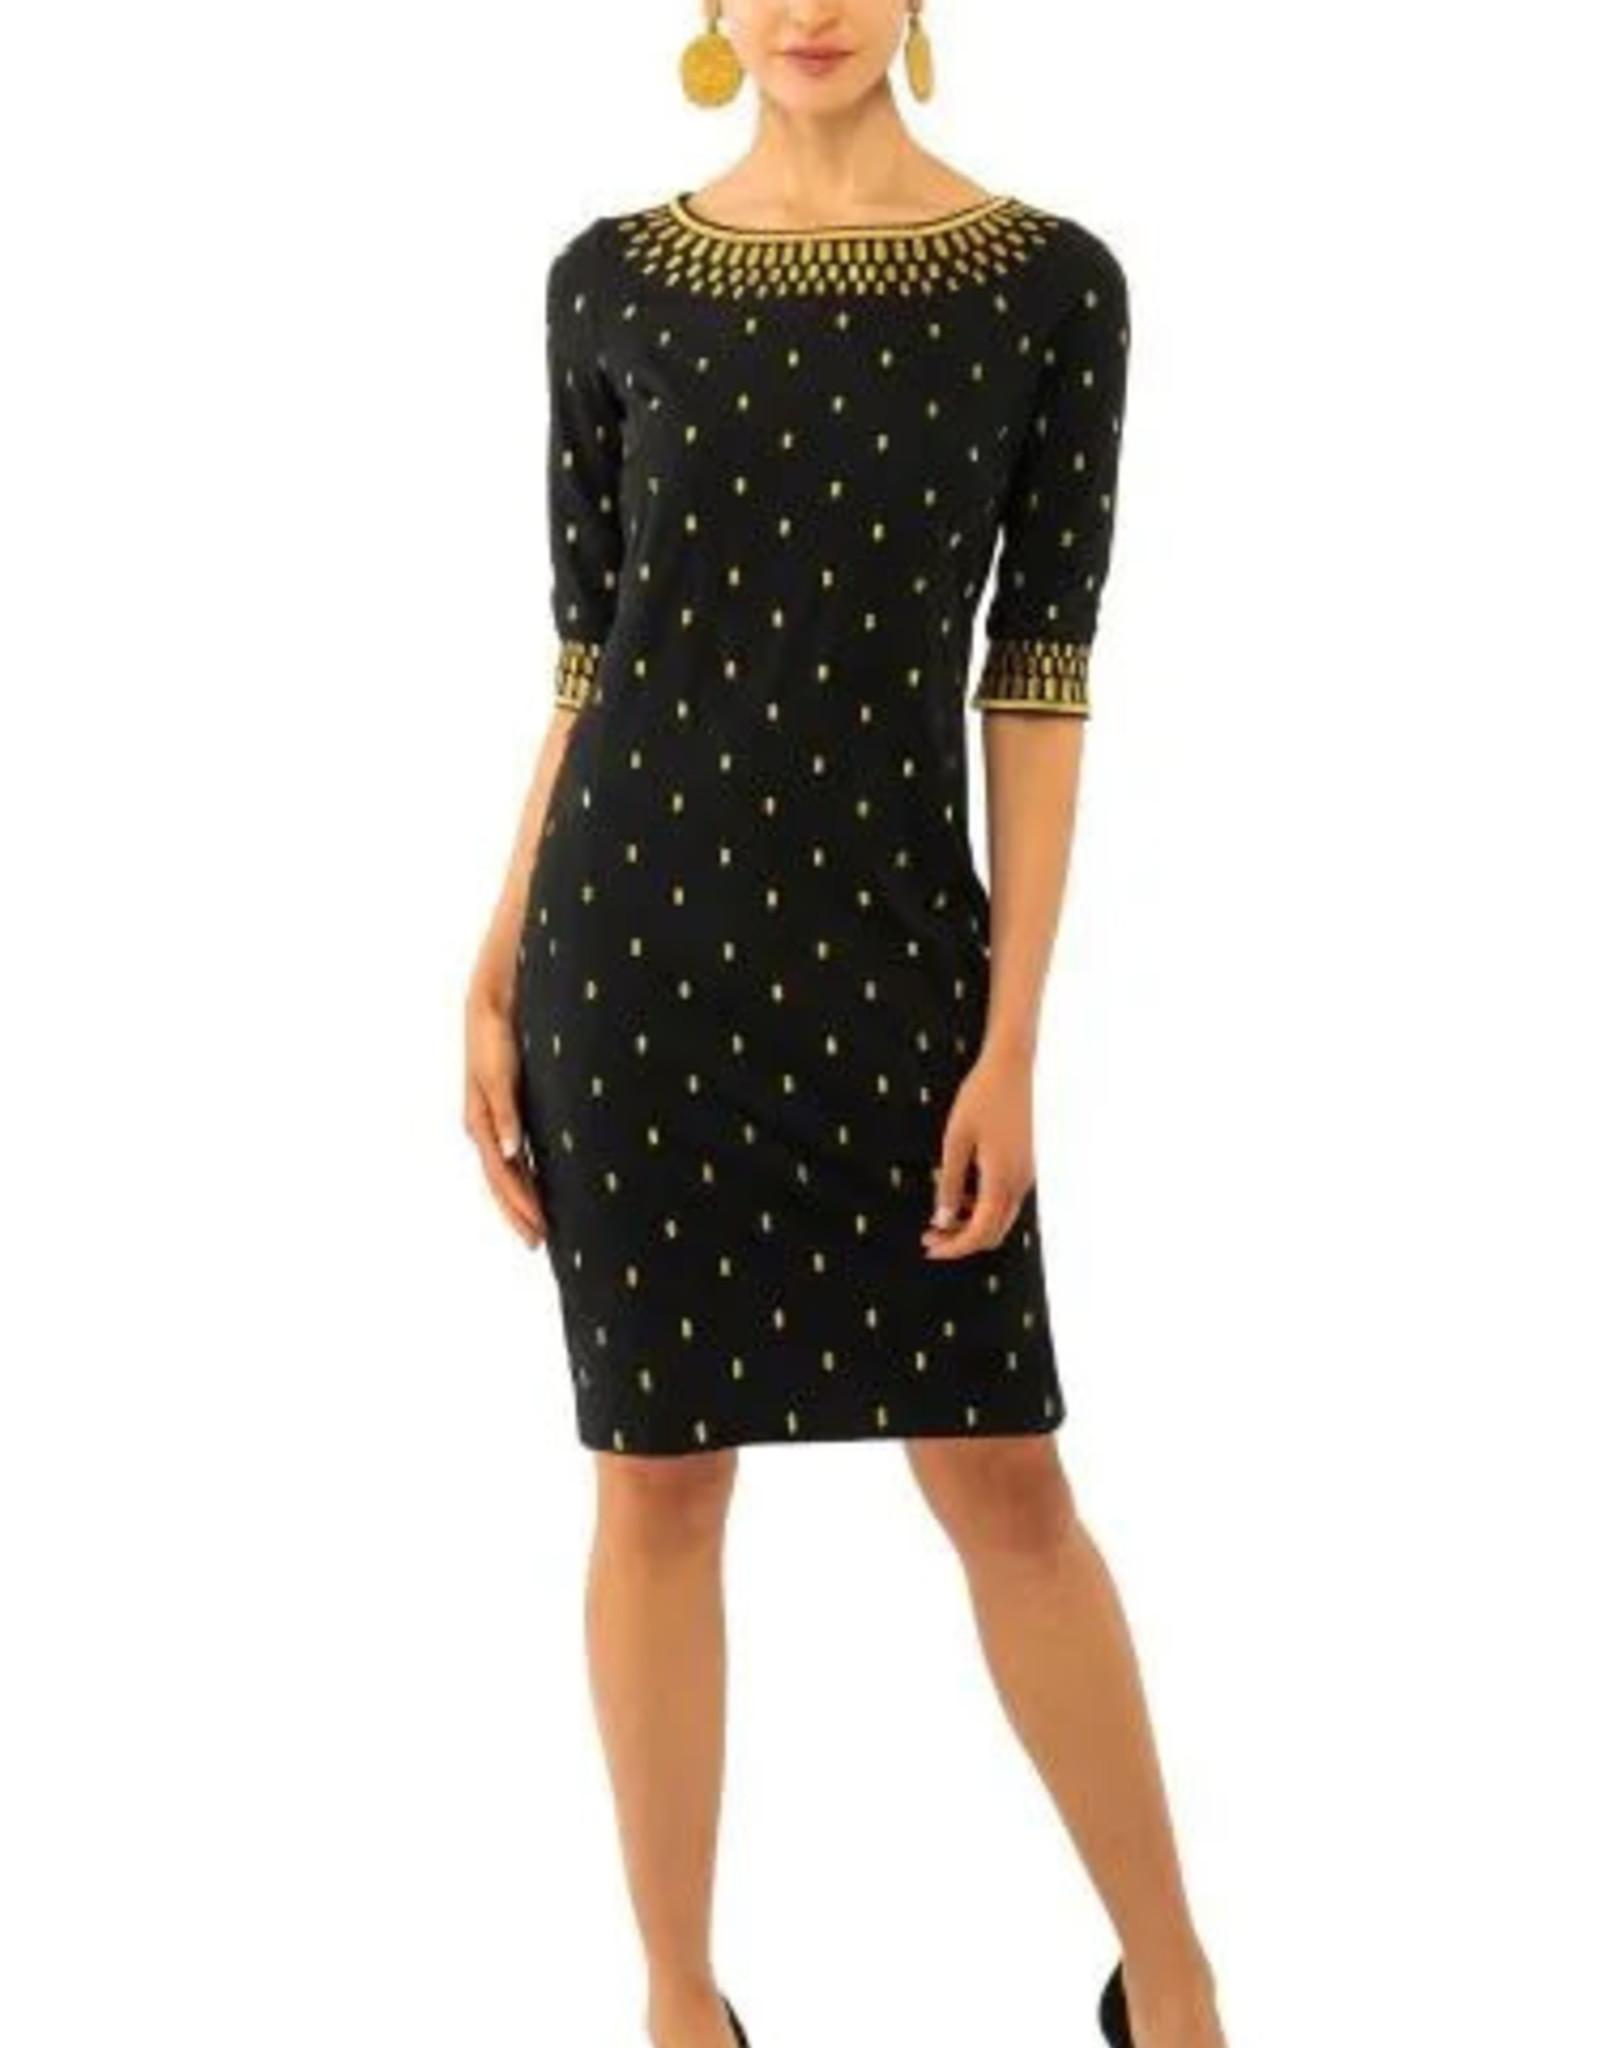 Gretchen Scott Rocket Girl Dress